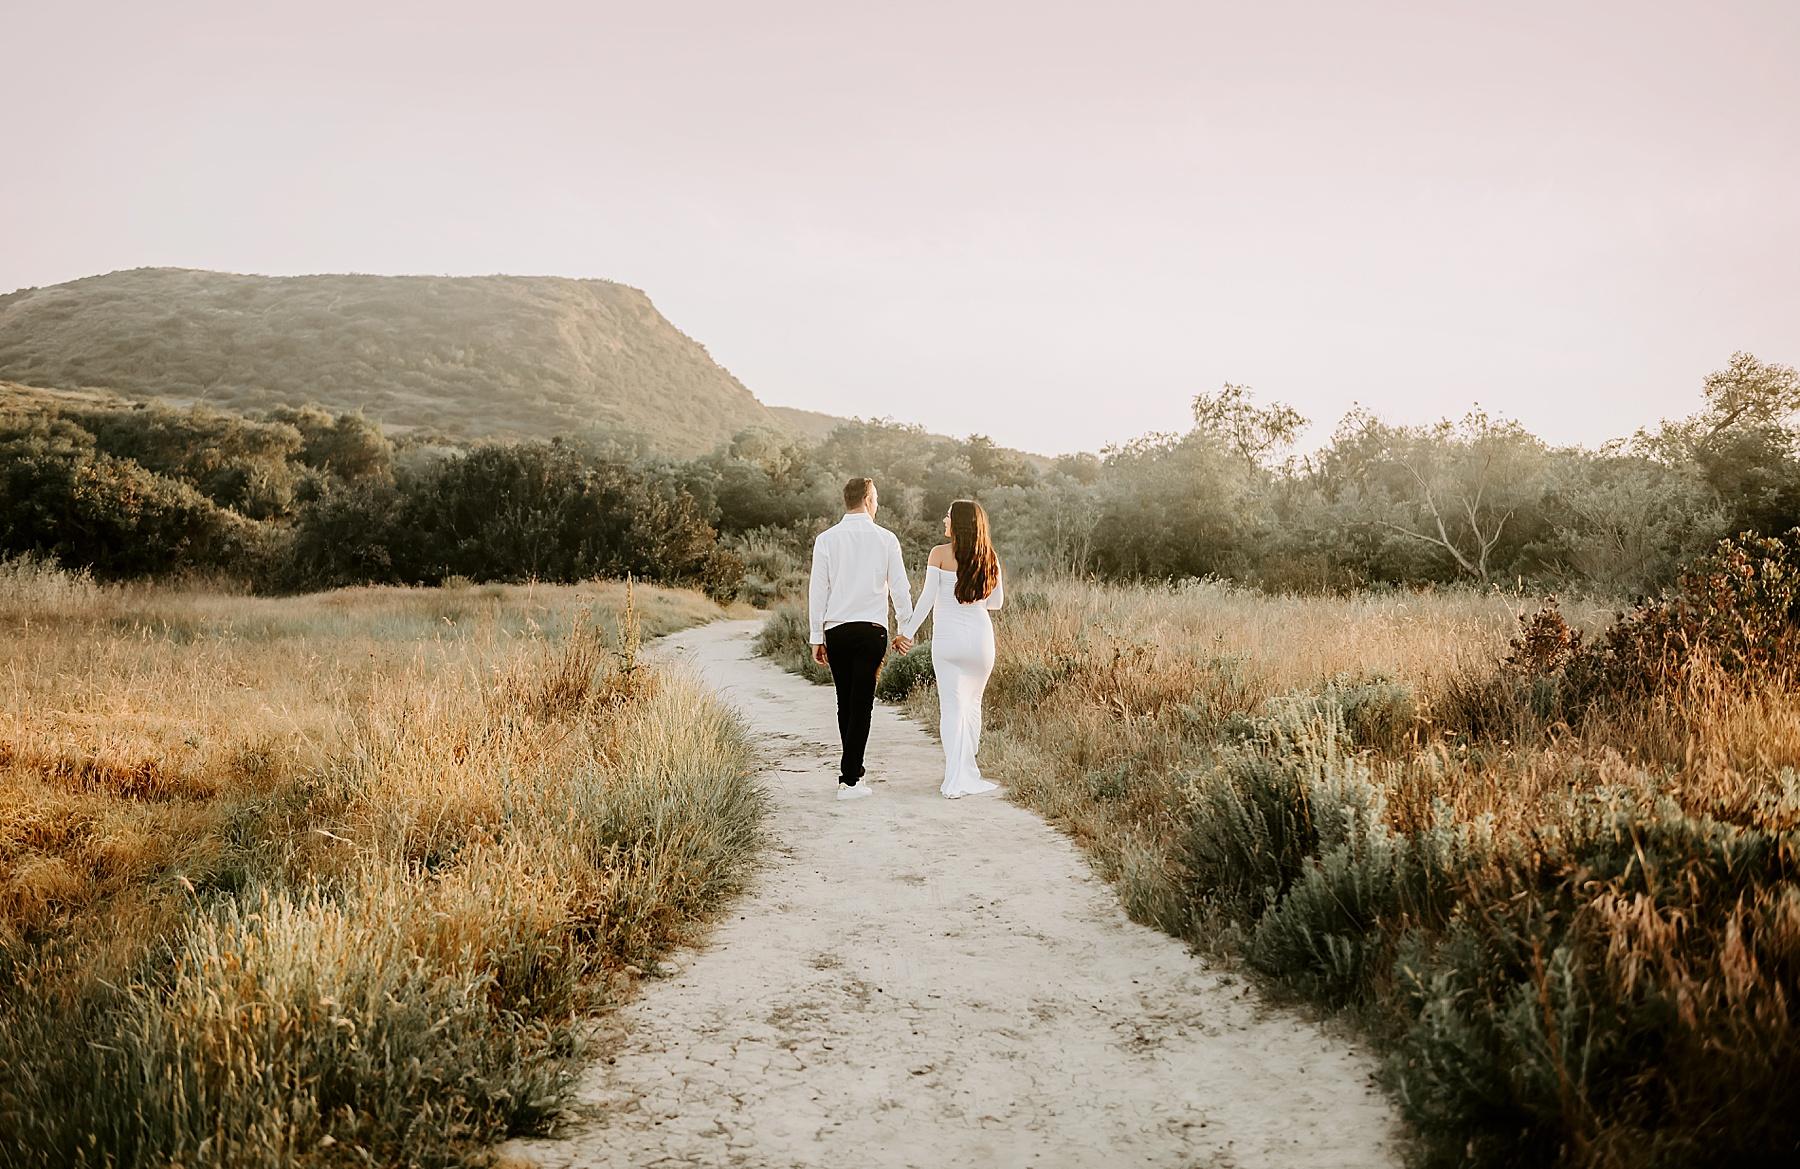 sunset field maternity session couple walking